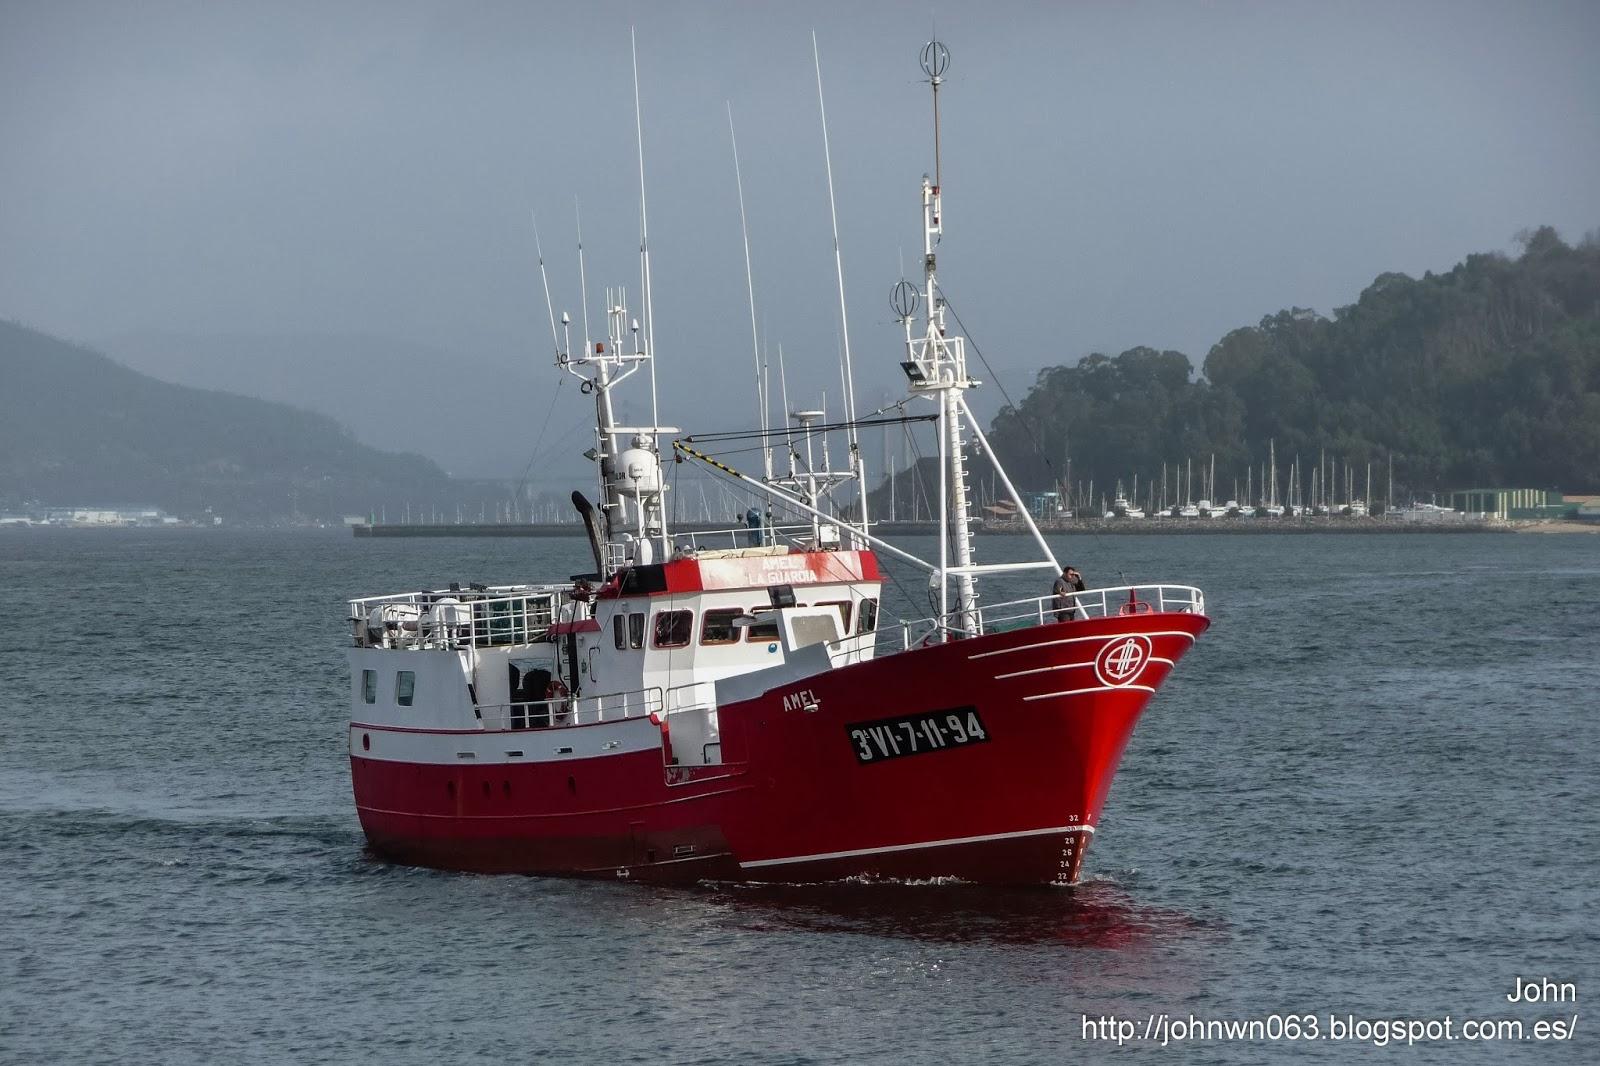 Fotos de barcos amel - Todo sobre barcos ...